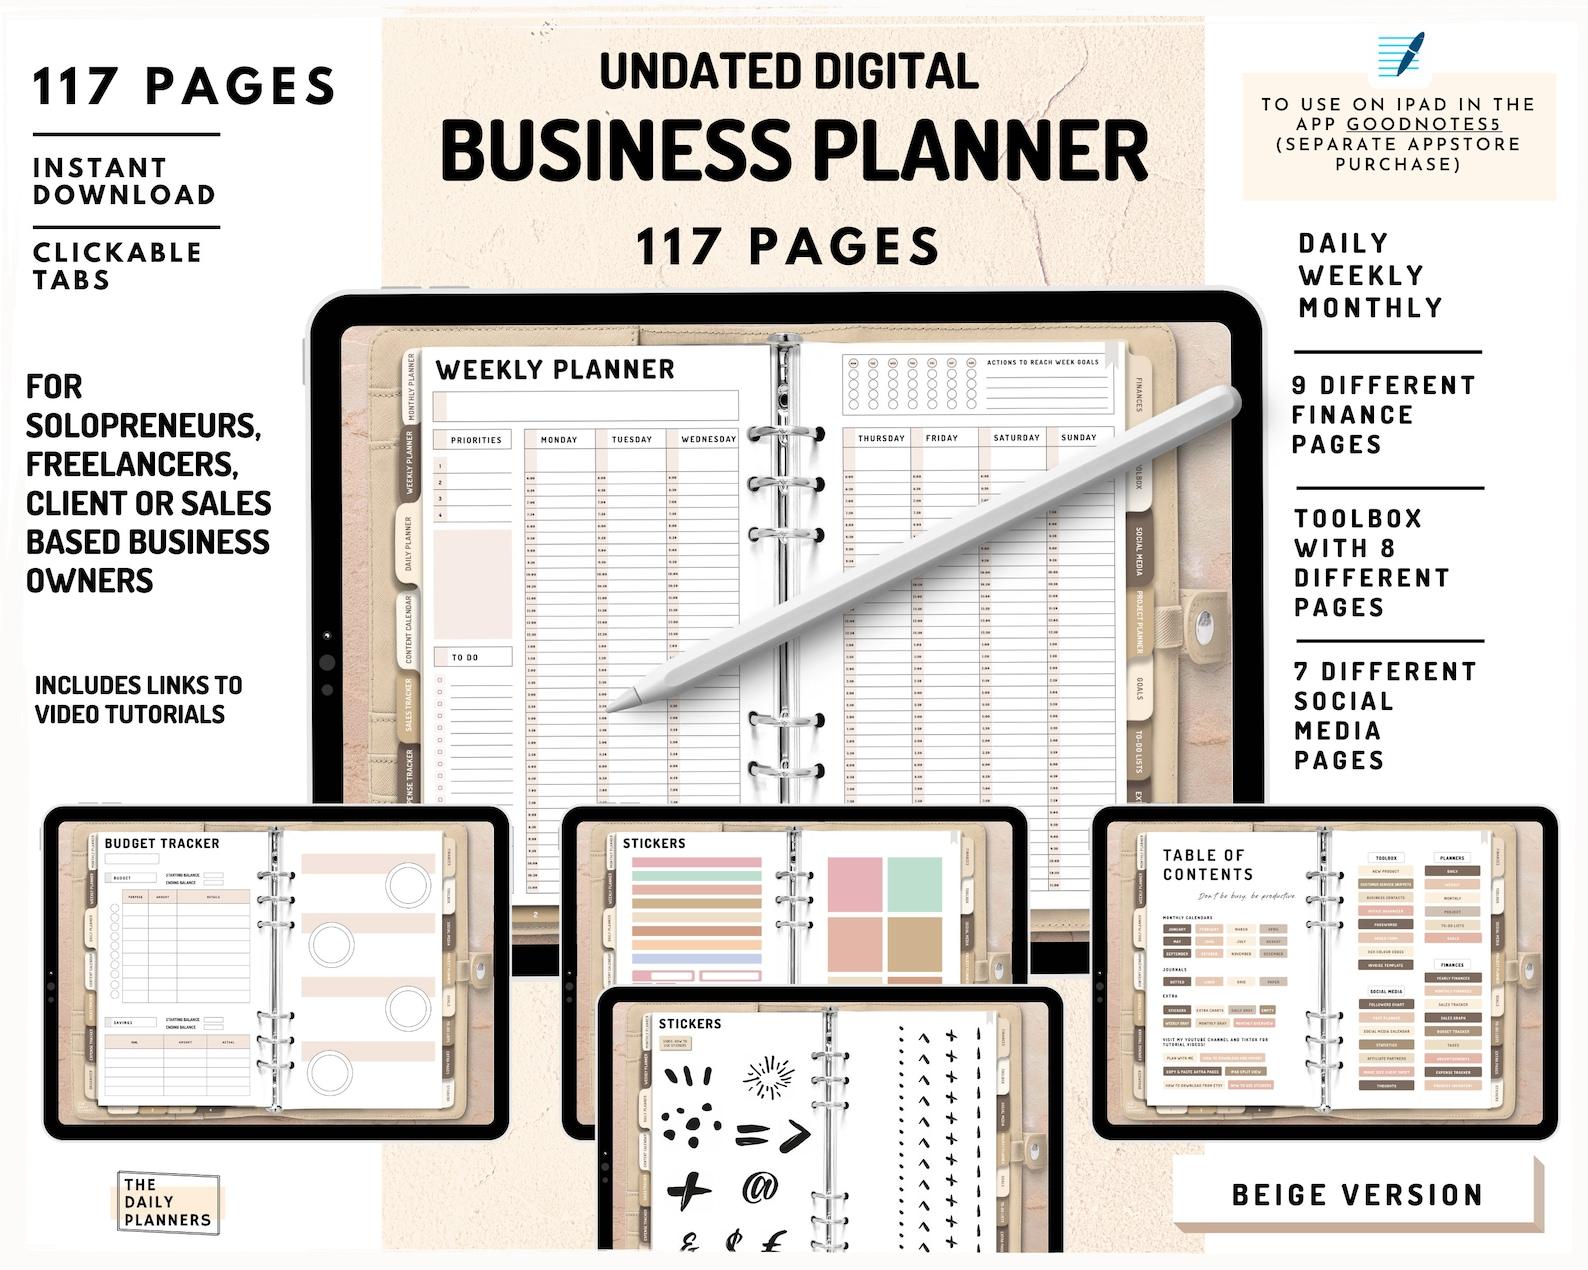 Undated Digital Business Planner